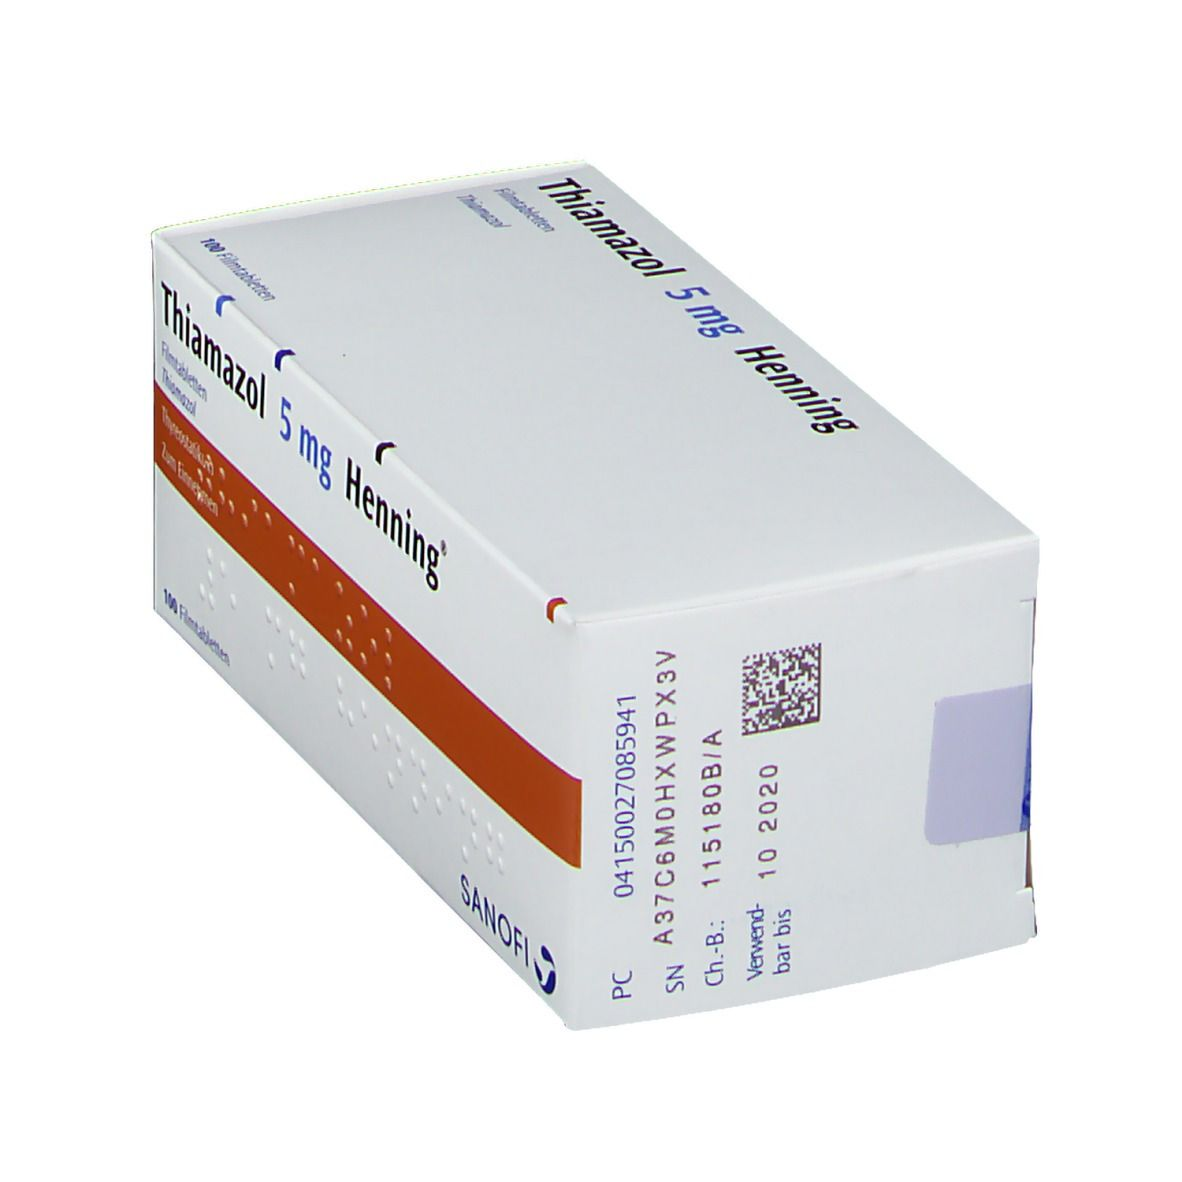 Thiamazol 5 mg Henning Filmtabl.